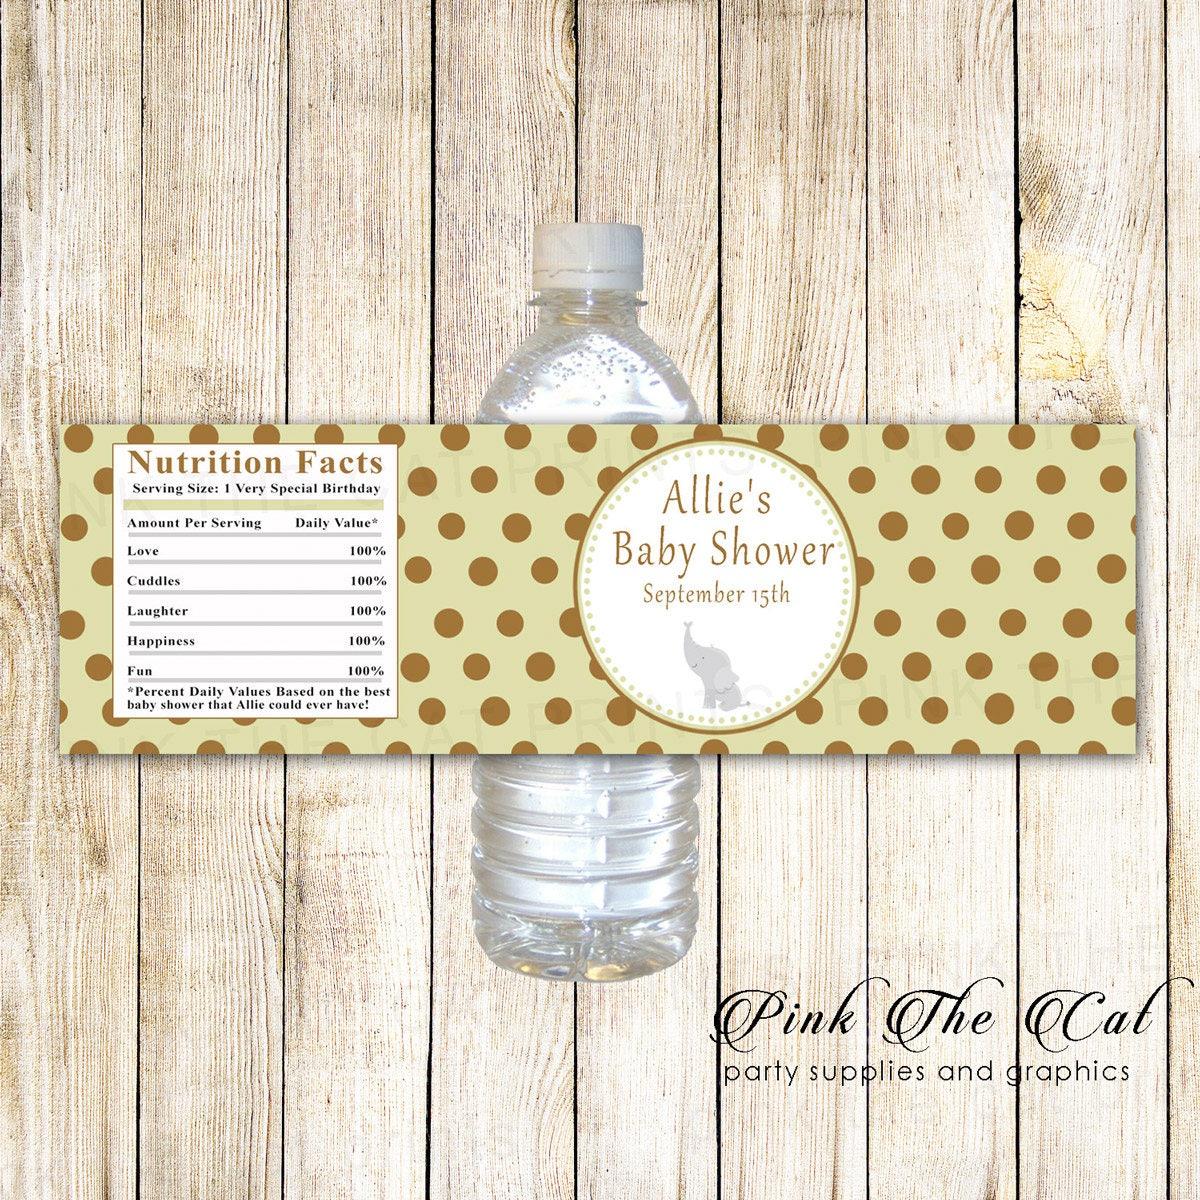 Elephant Water Bottle Labels Elephany Baby Shower Water Labels Brown Sage Green Shower Bottle Labels Printable Elephant Bottle Stickers